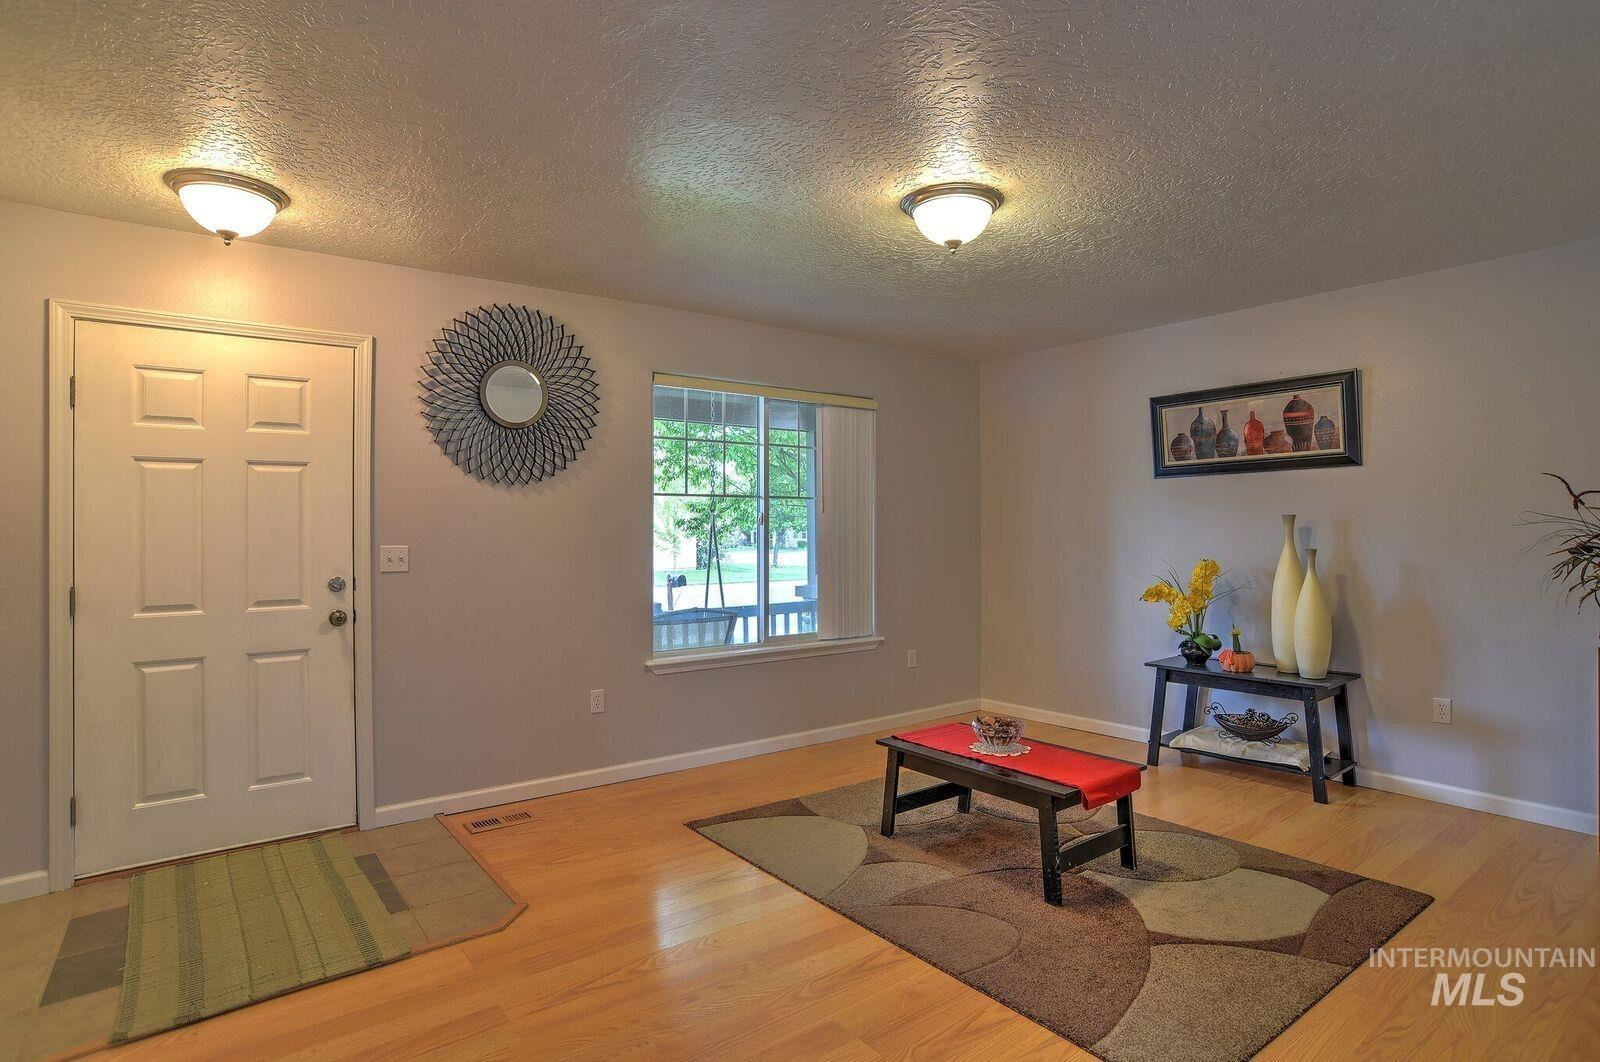 Photo of 5998 S. Santa Cruz Ave, Boise, ID 83709 (MLS # 98819358)